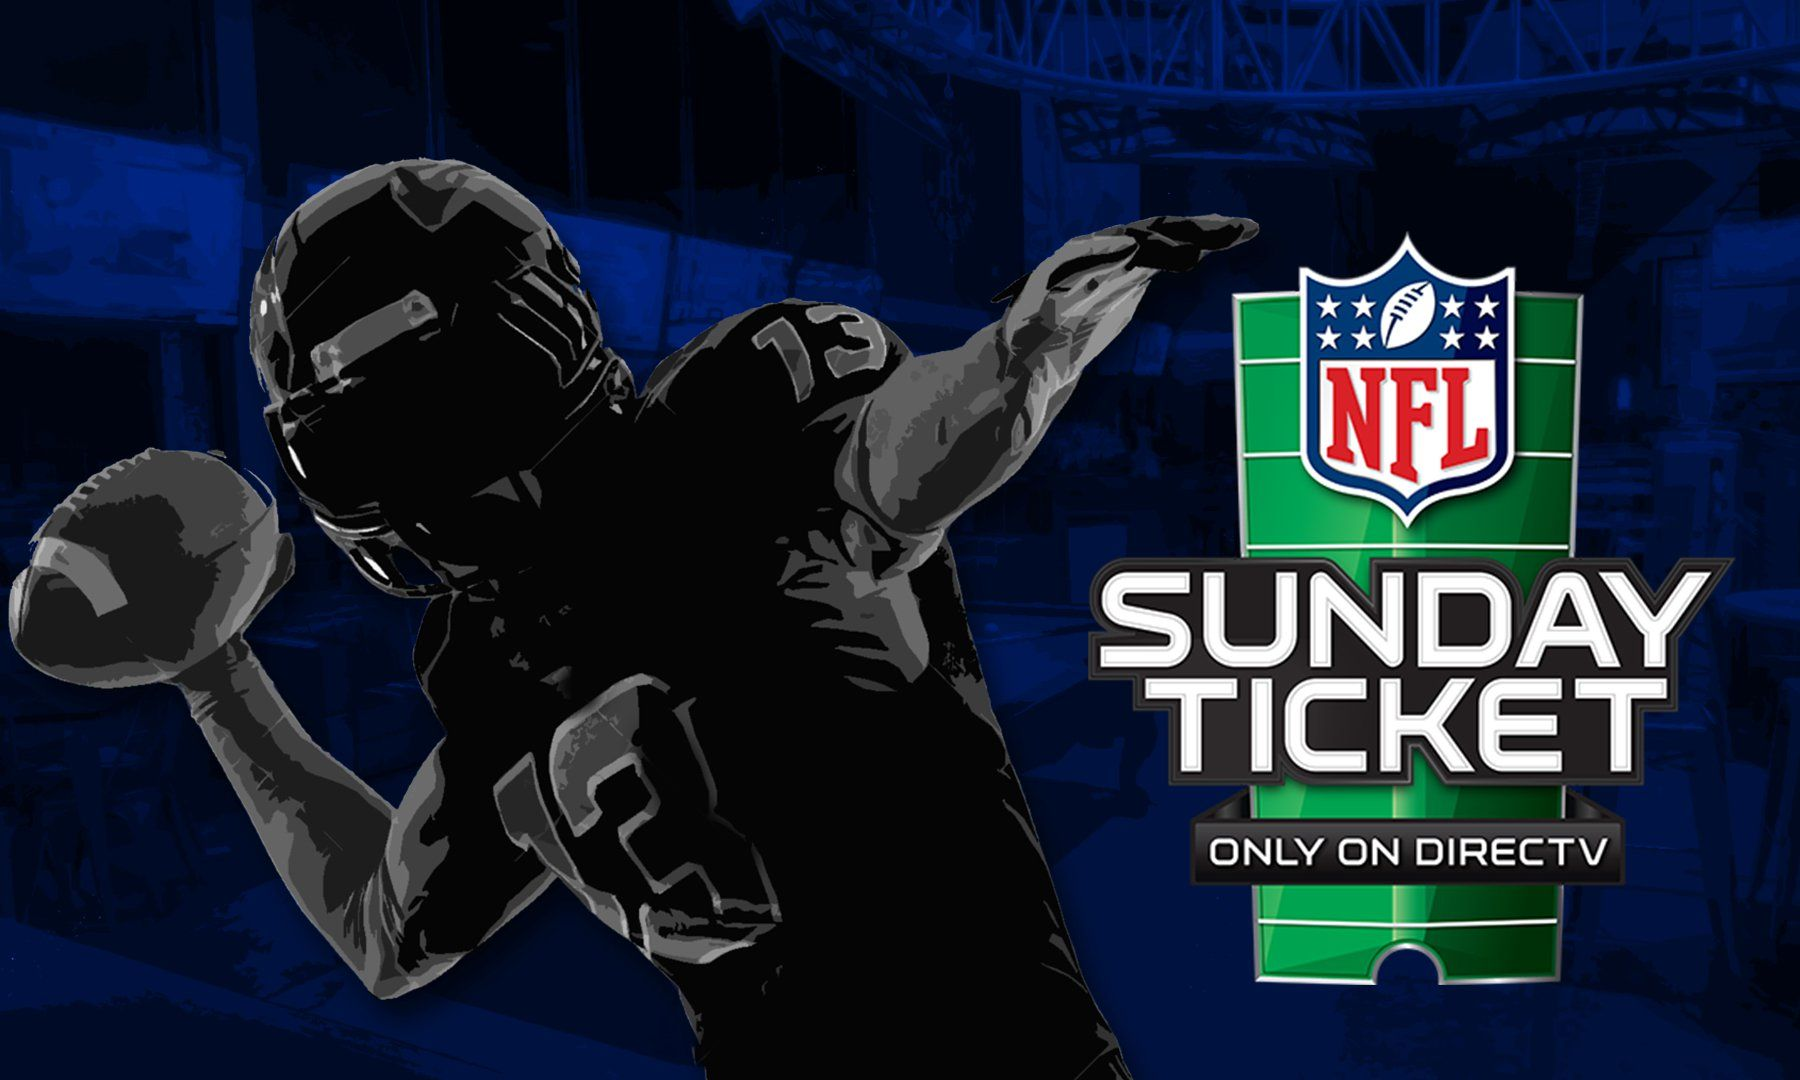 NFL Sunday Ticket Canceled, DirecTV Closing the Service